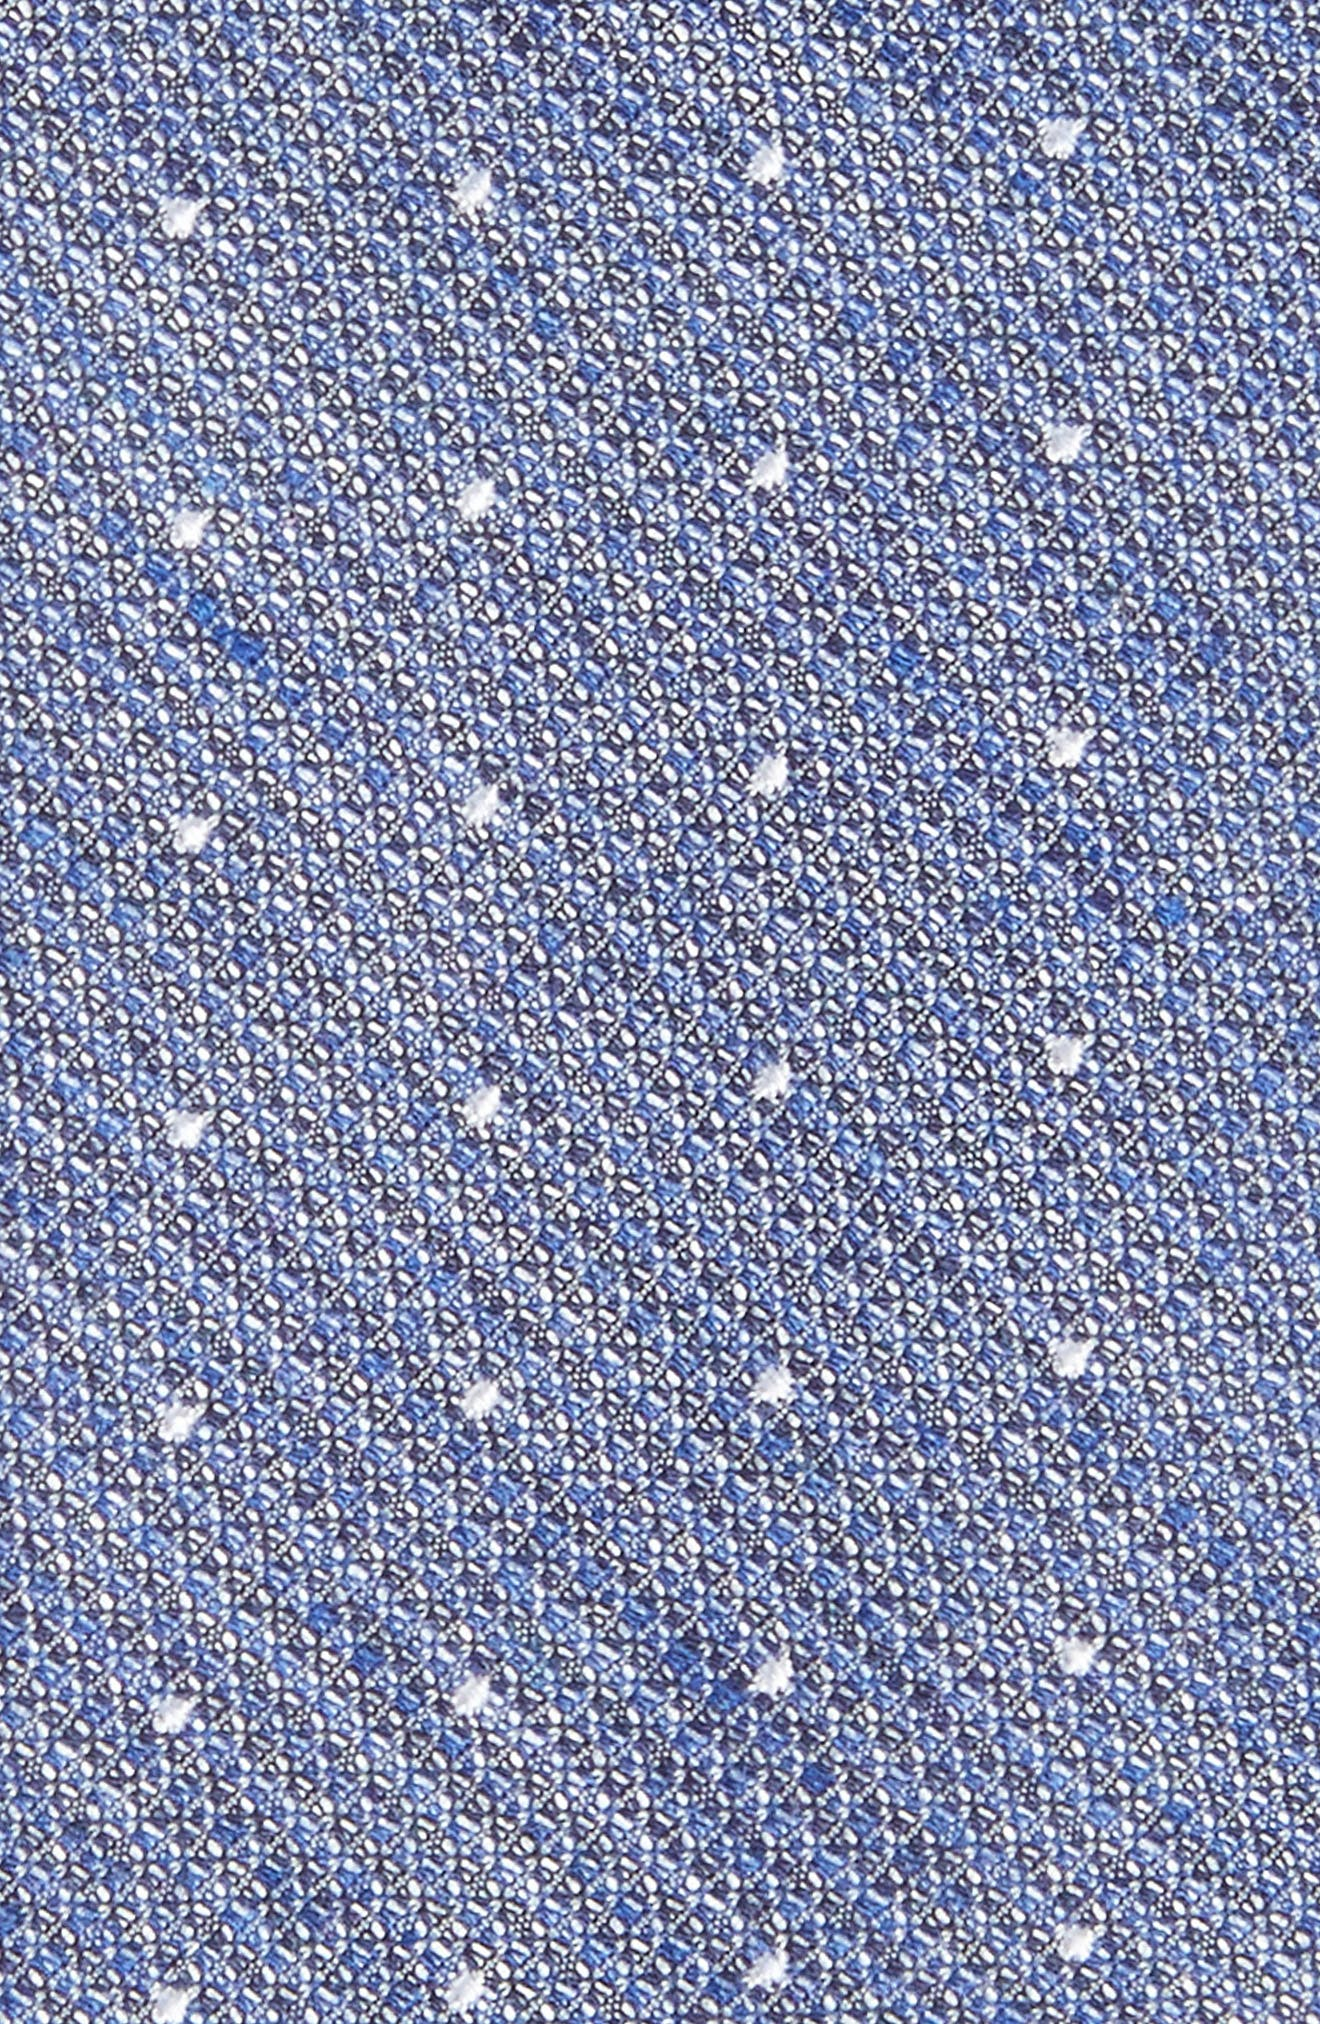 Dot Silk Blend Skinny Tie,                             Alternate thumbnail 2, color,                             100